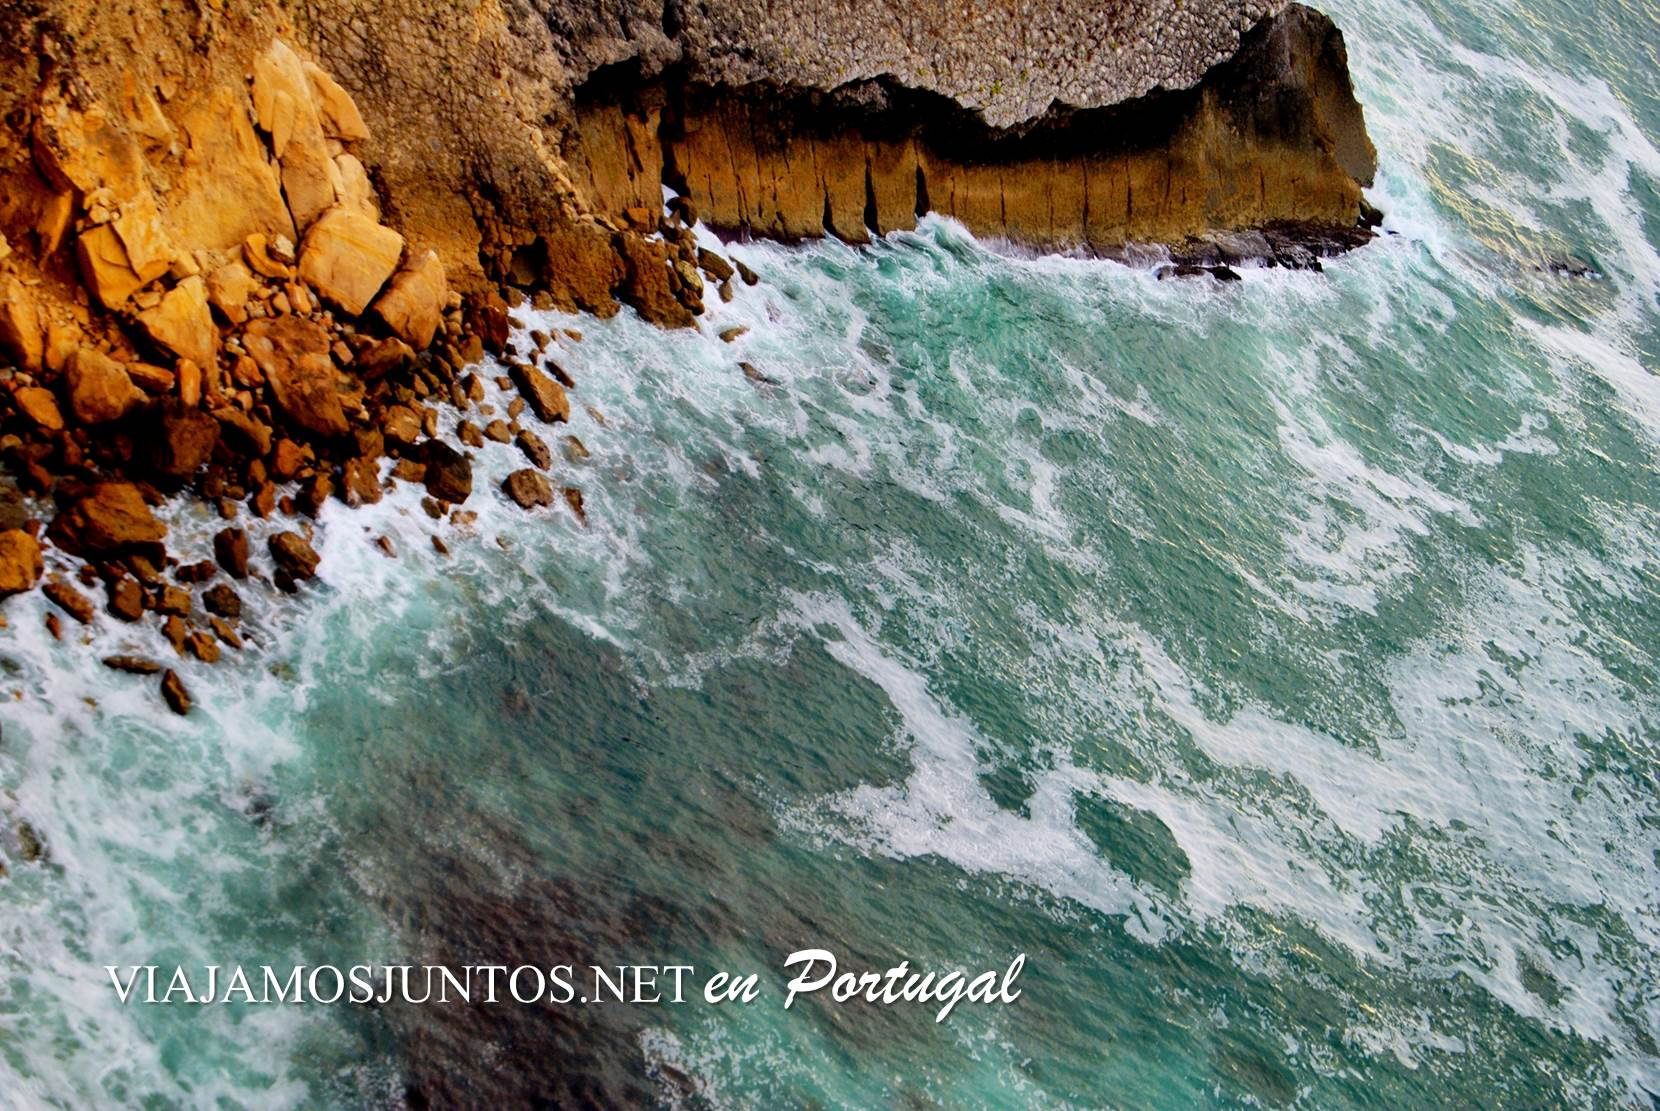 Las aguas bravas del Cabo Espichel, Portugal